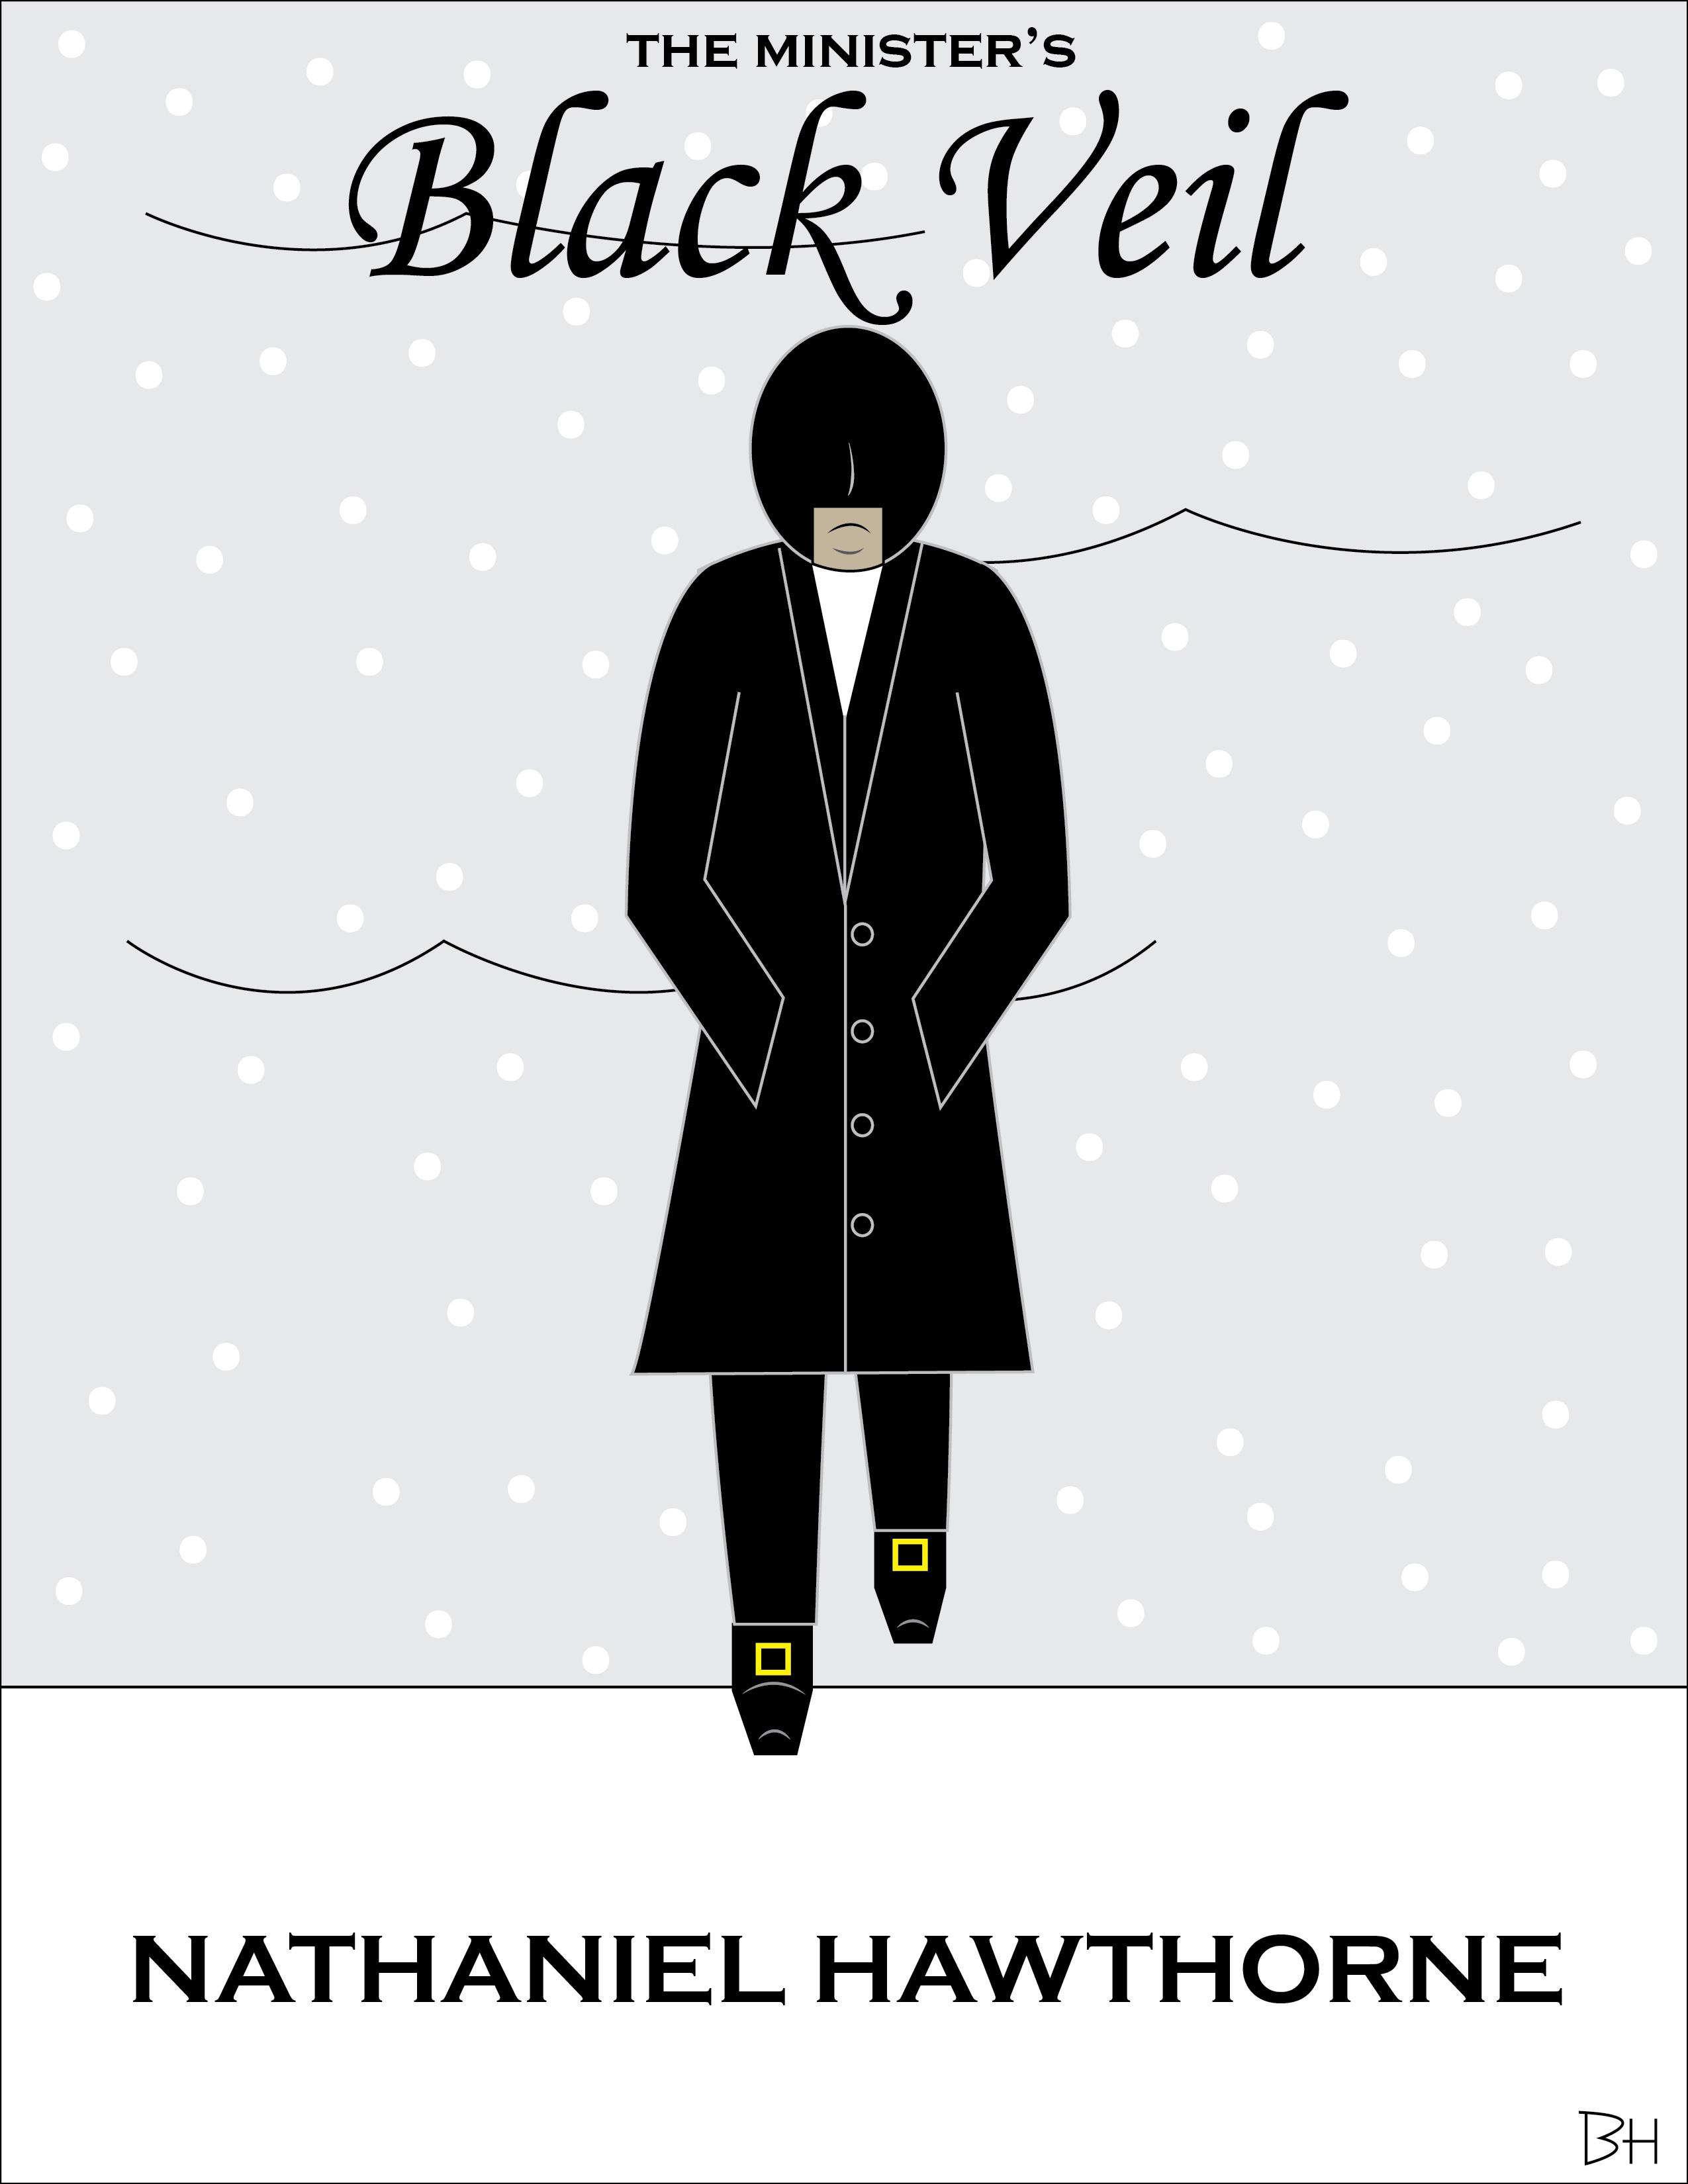 black essay minister veil